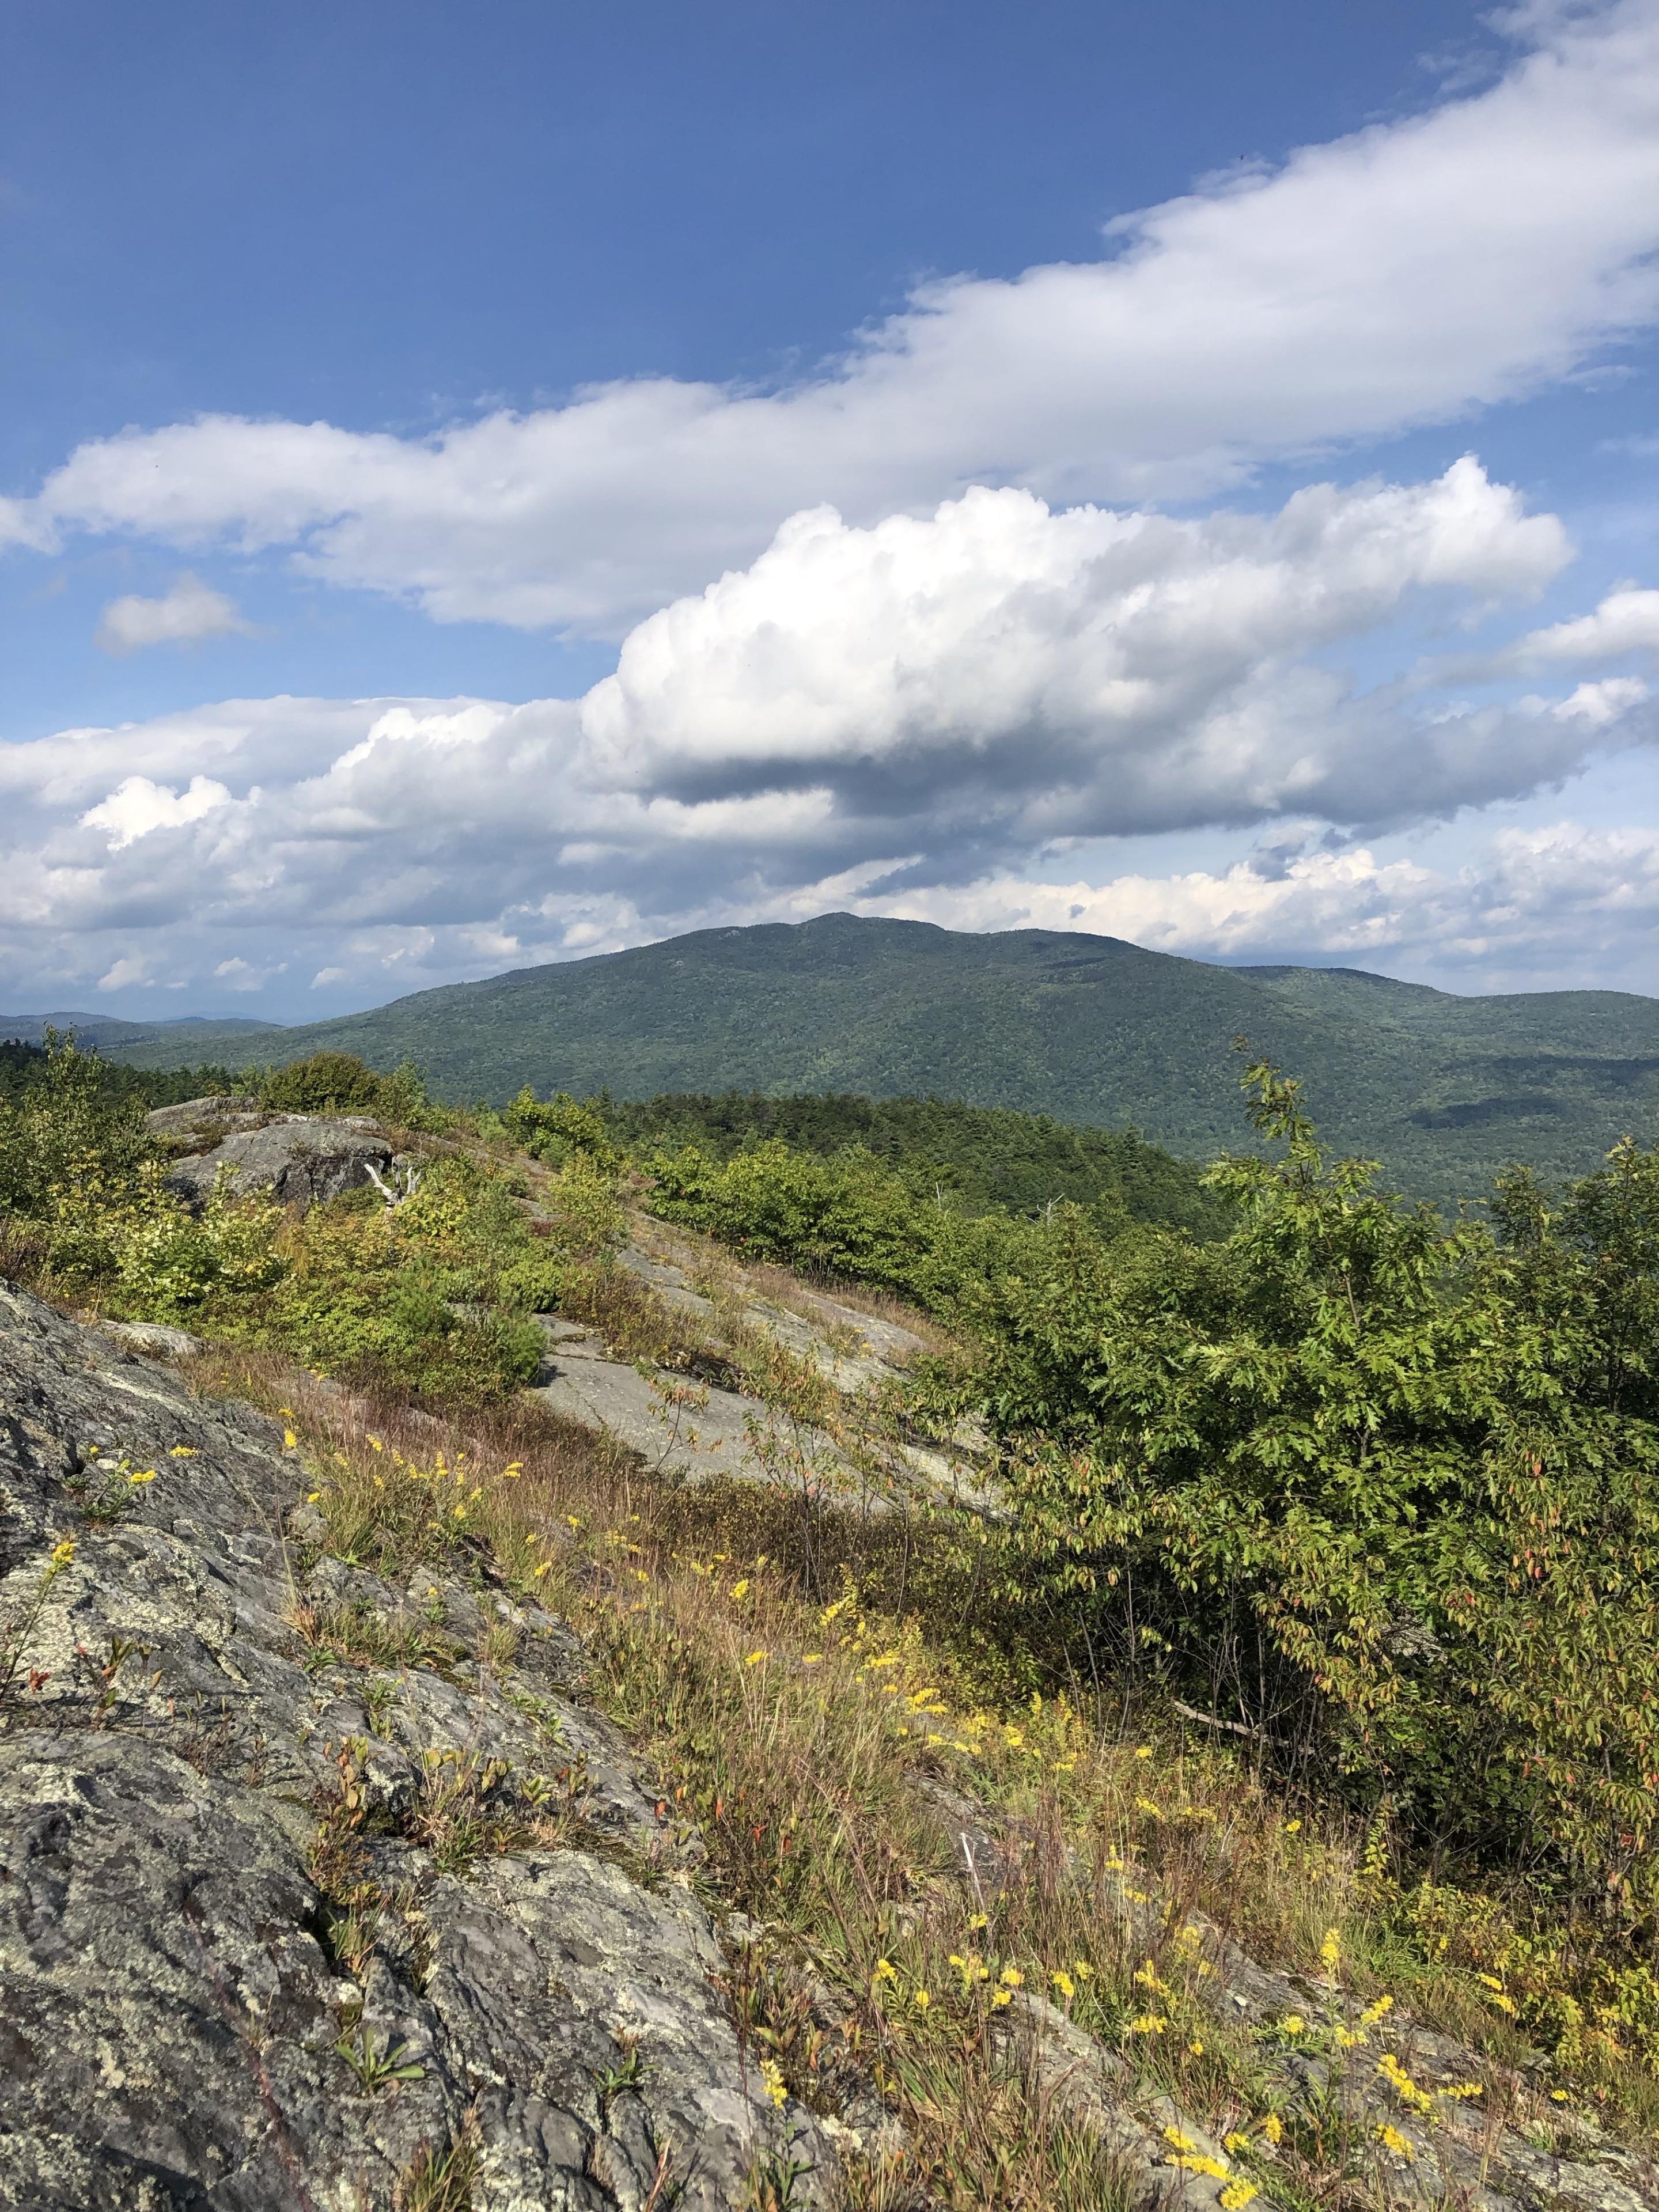 Rumney, New Hampshire, United States of America